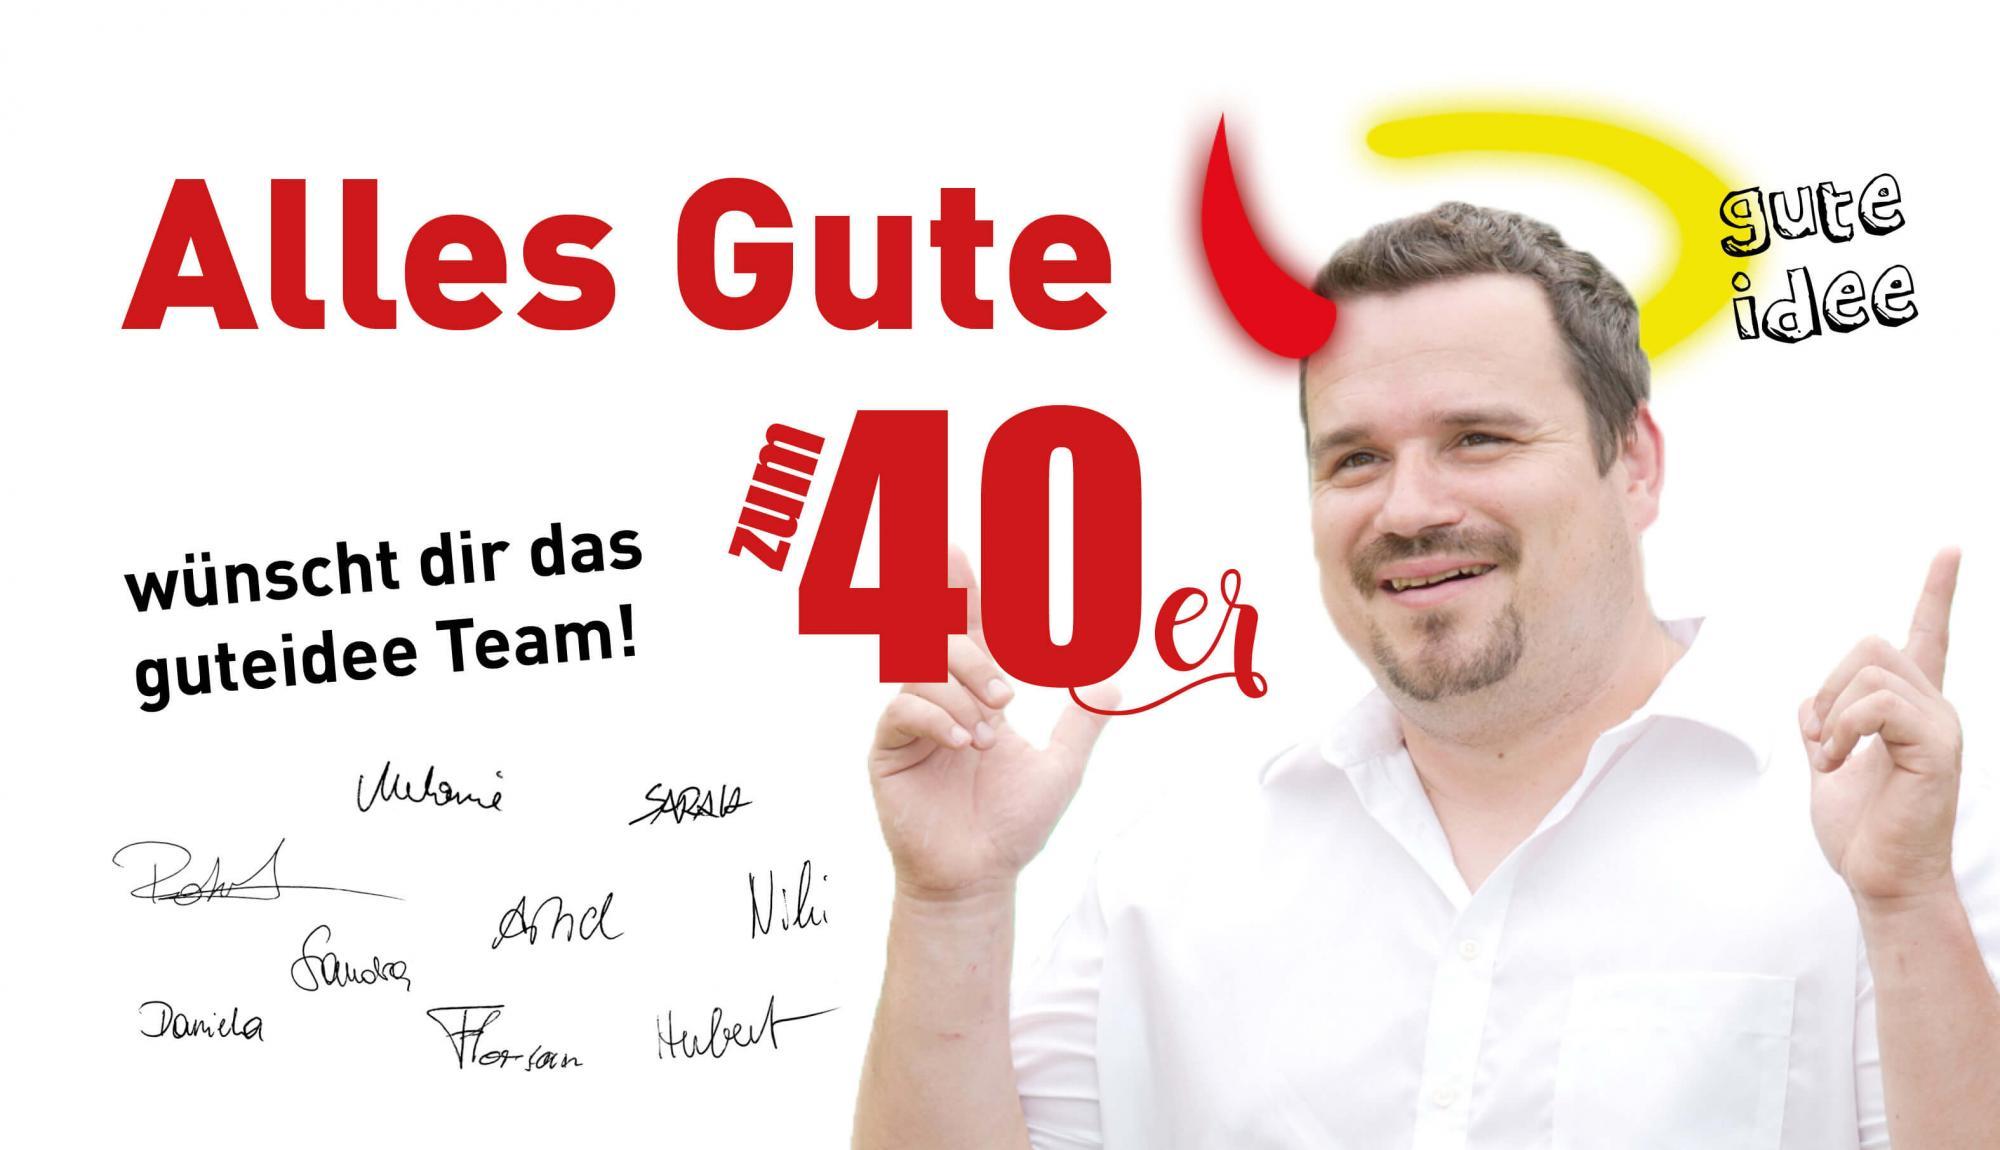 guteideeat--article-1232-0.jpeg